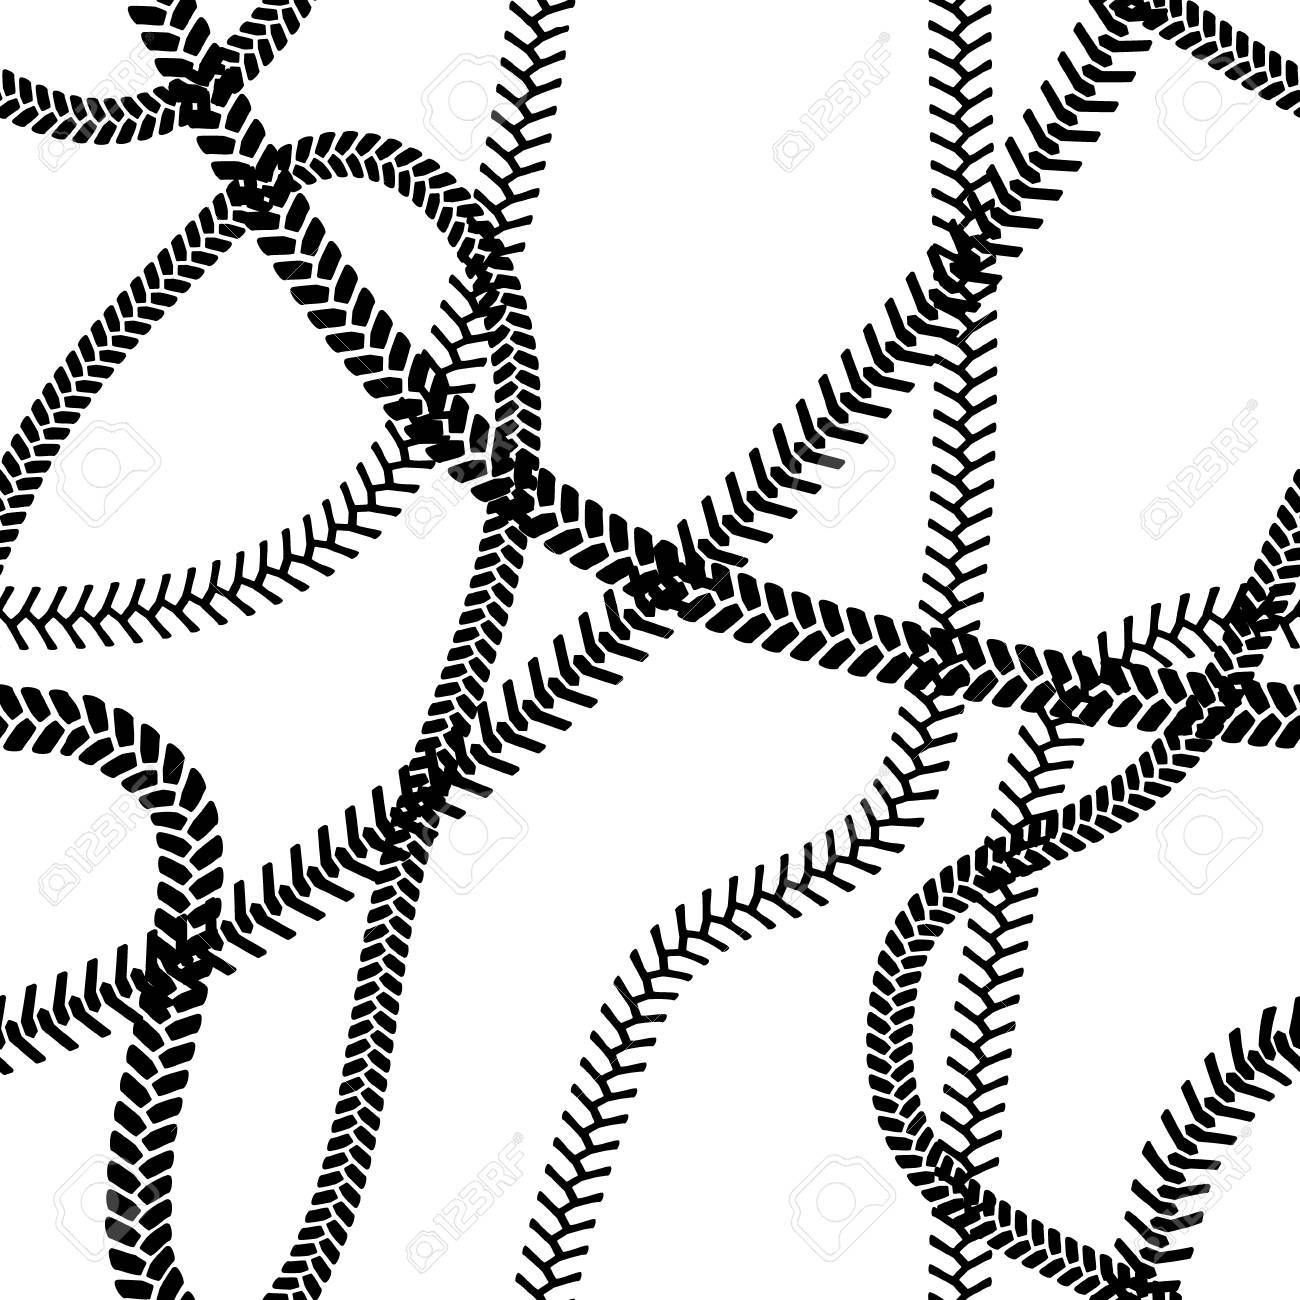 black and white tire tread protector track seamless pattern rh 123rf com tire tread vector image tire tread vector graphic